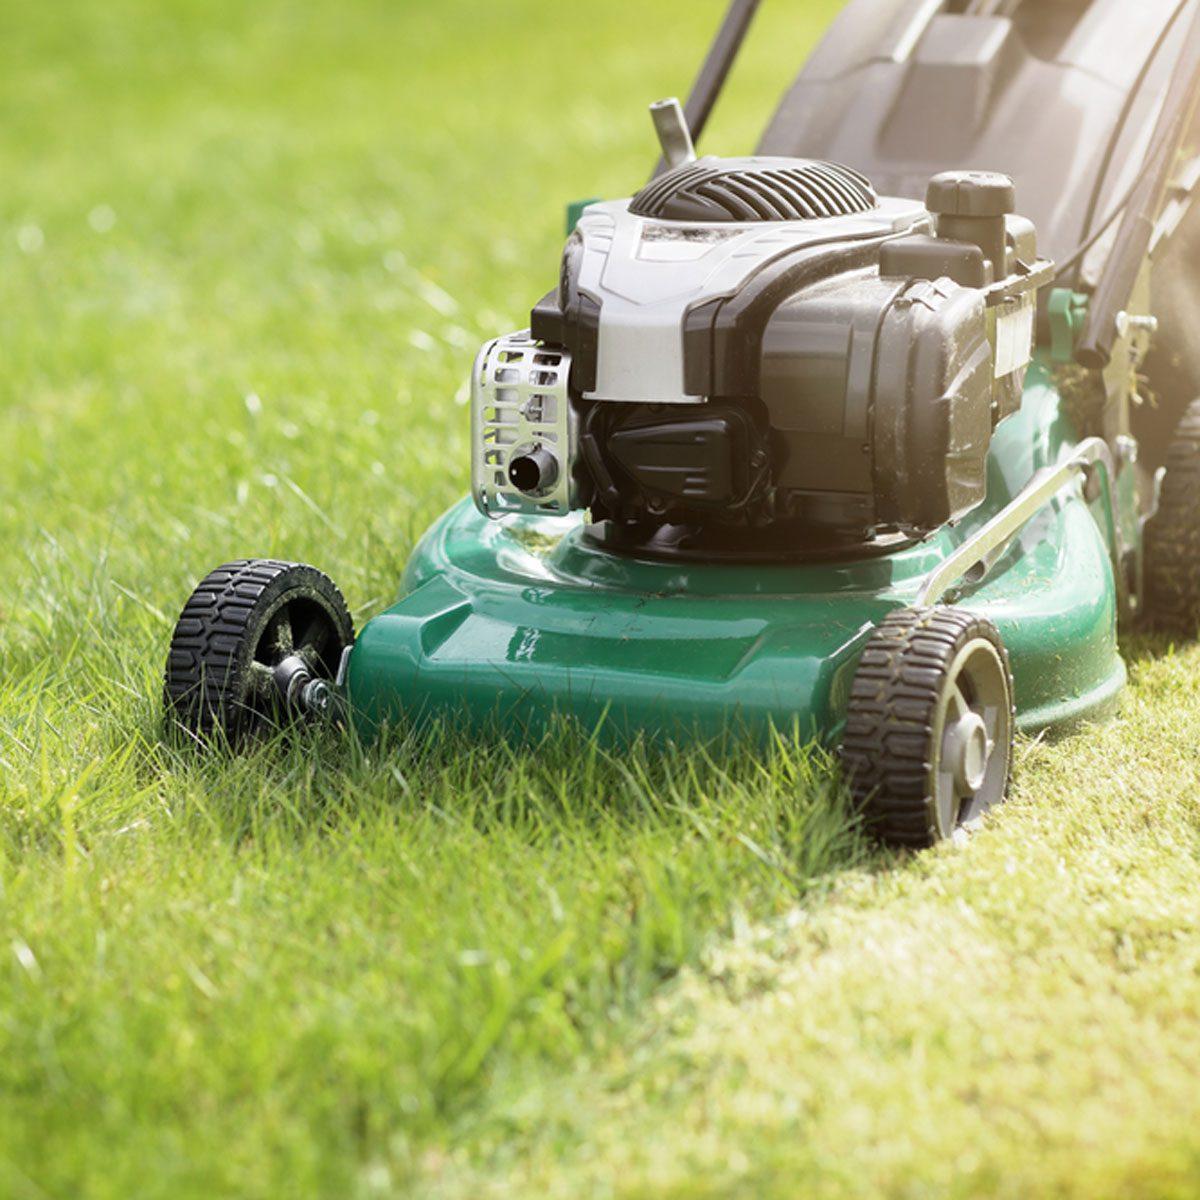 Mowing lawn short